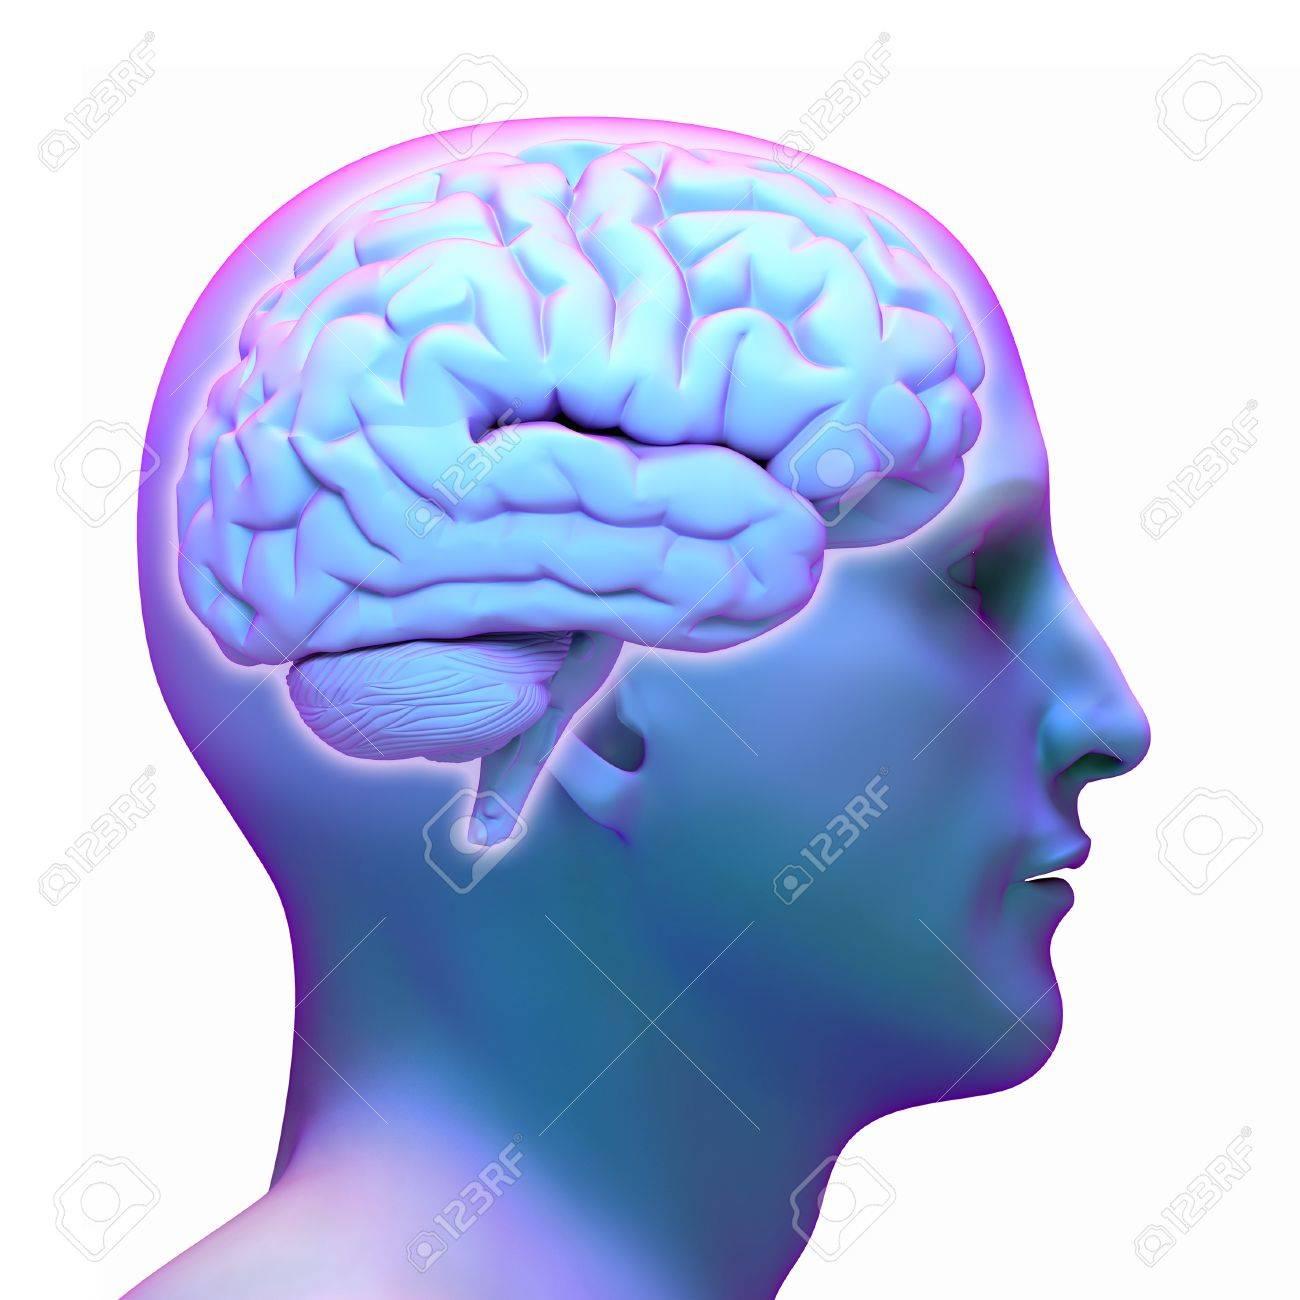 Brain diagram in human head on white background stock photo brain diagram in human head on white background stock photo 42047655 ccuart Image collections